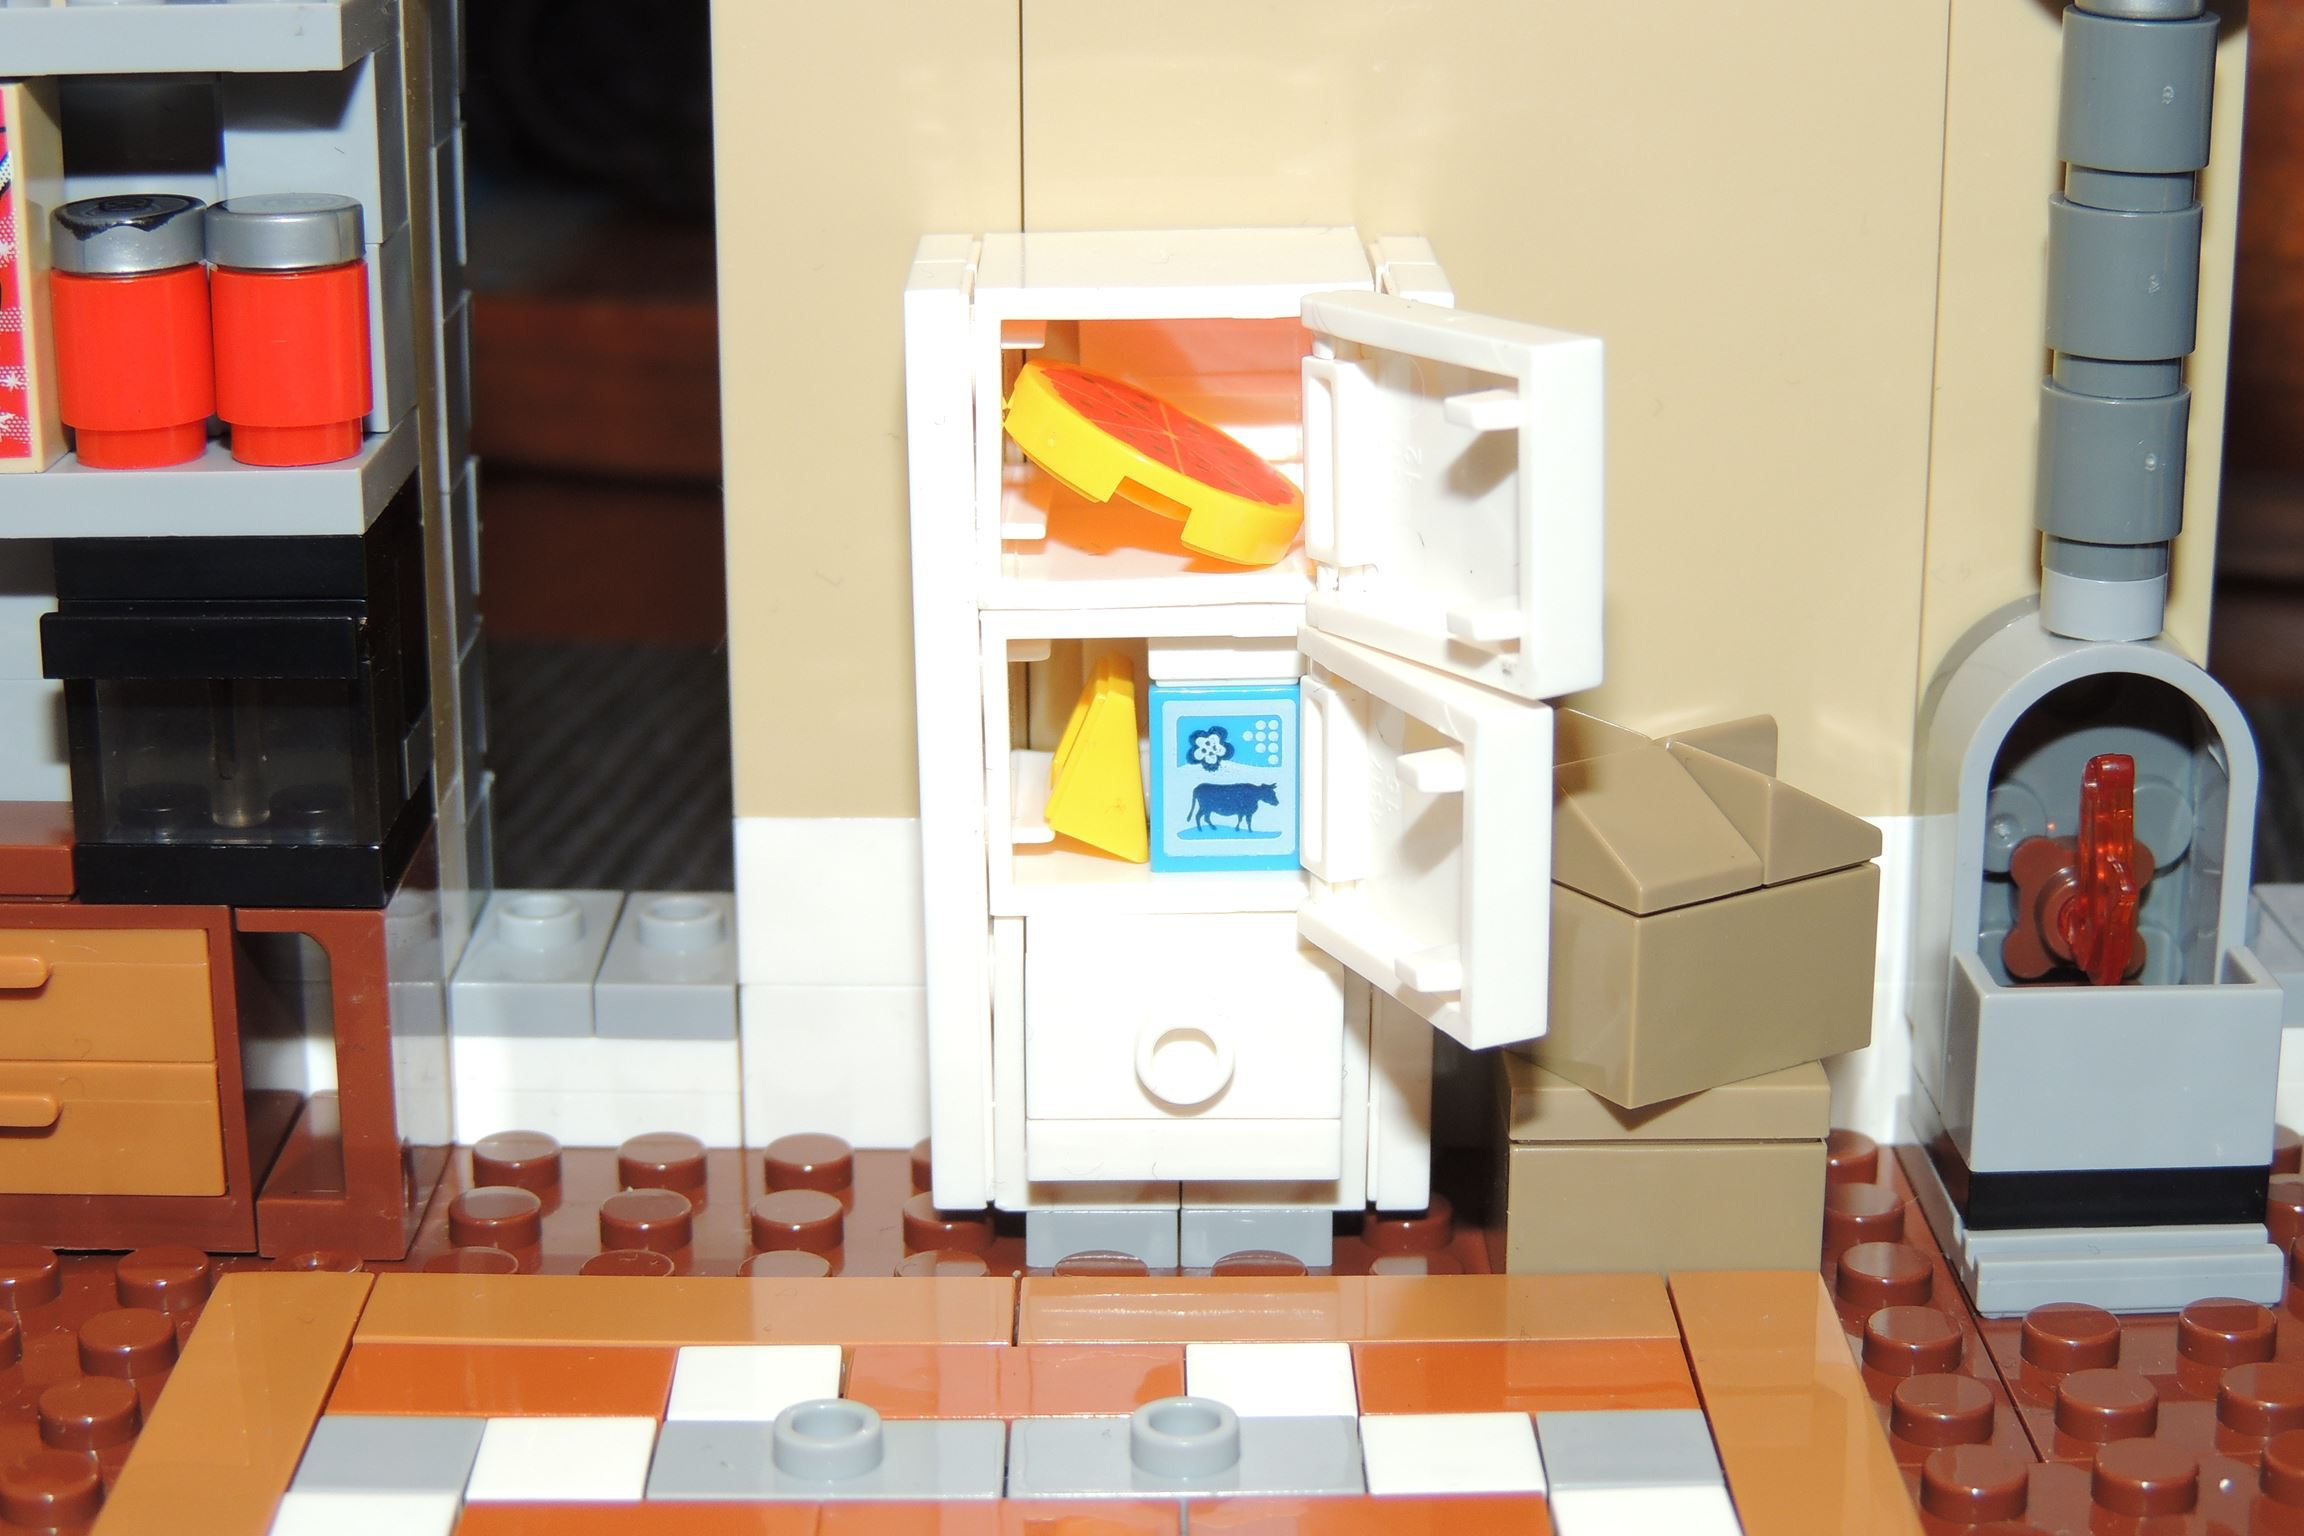 Freu mich, wenn der Kühlschrank dann umgezogen ist.